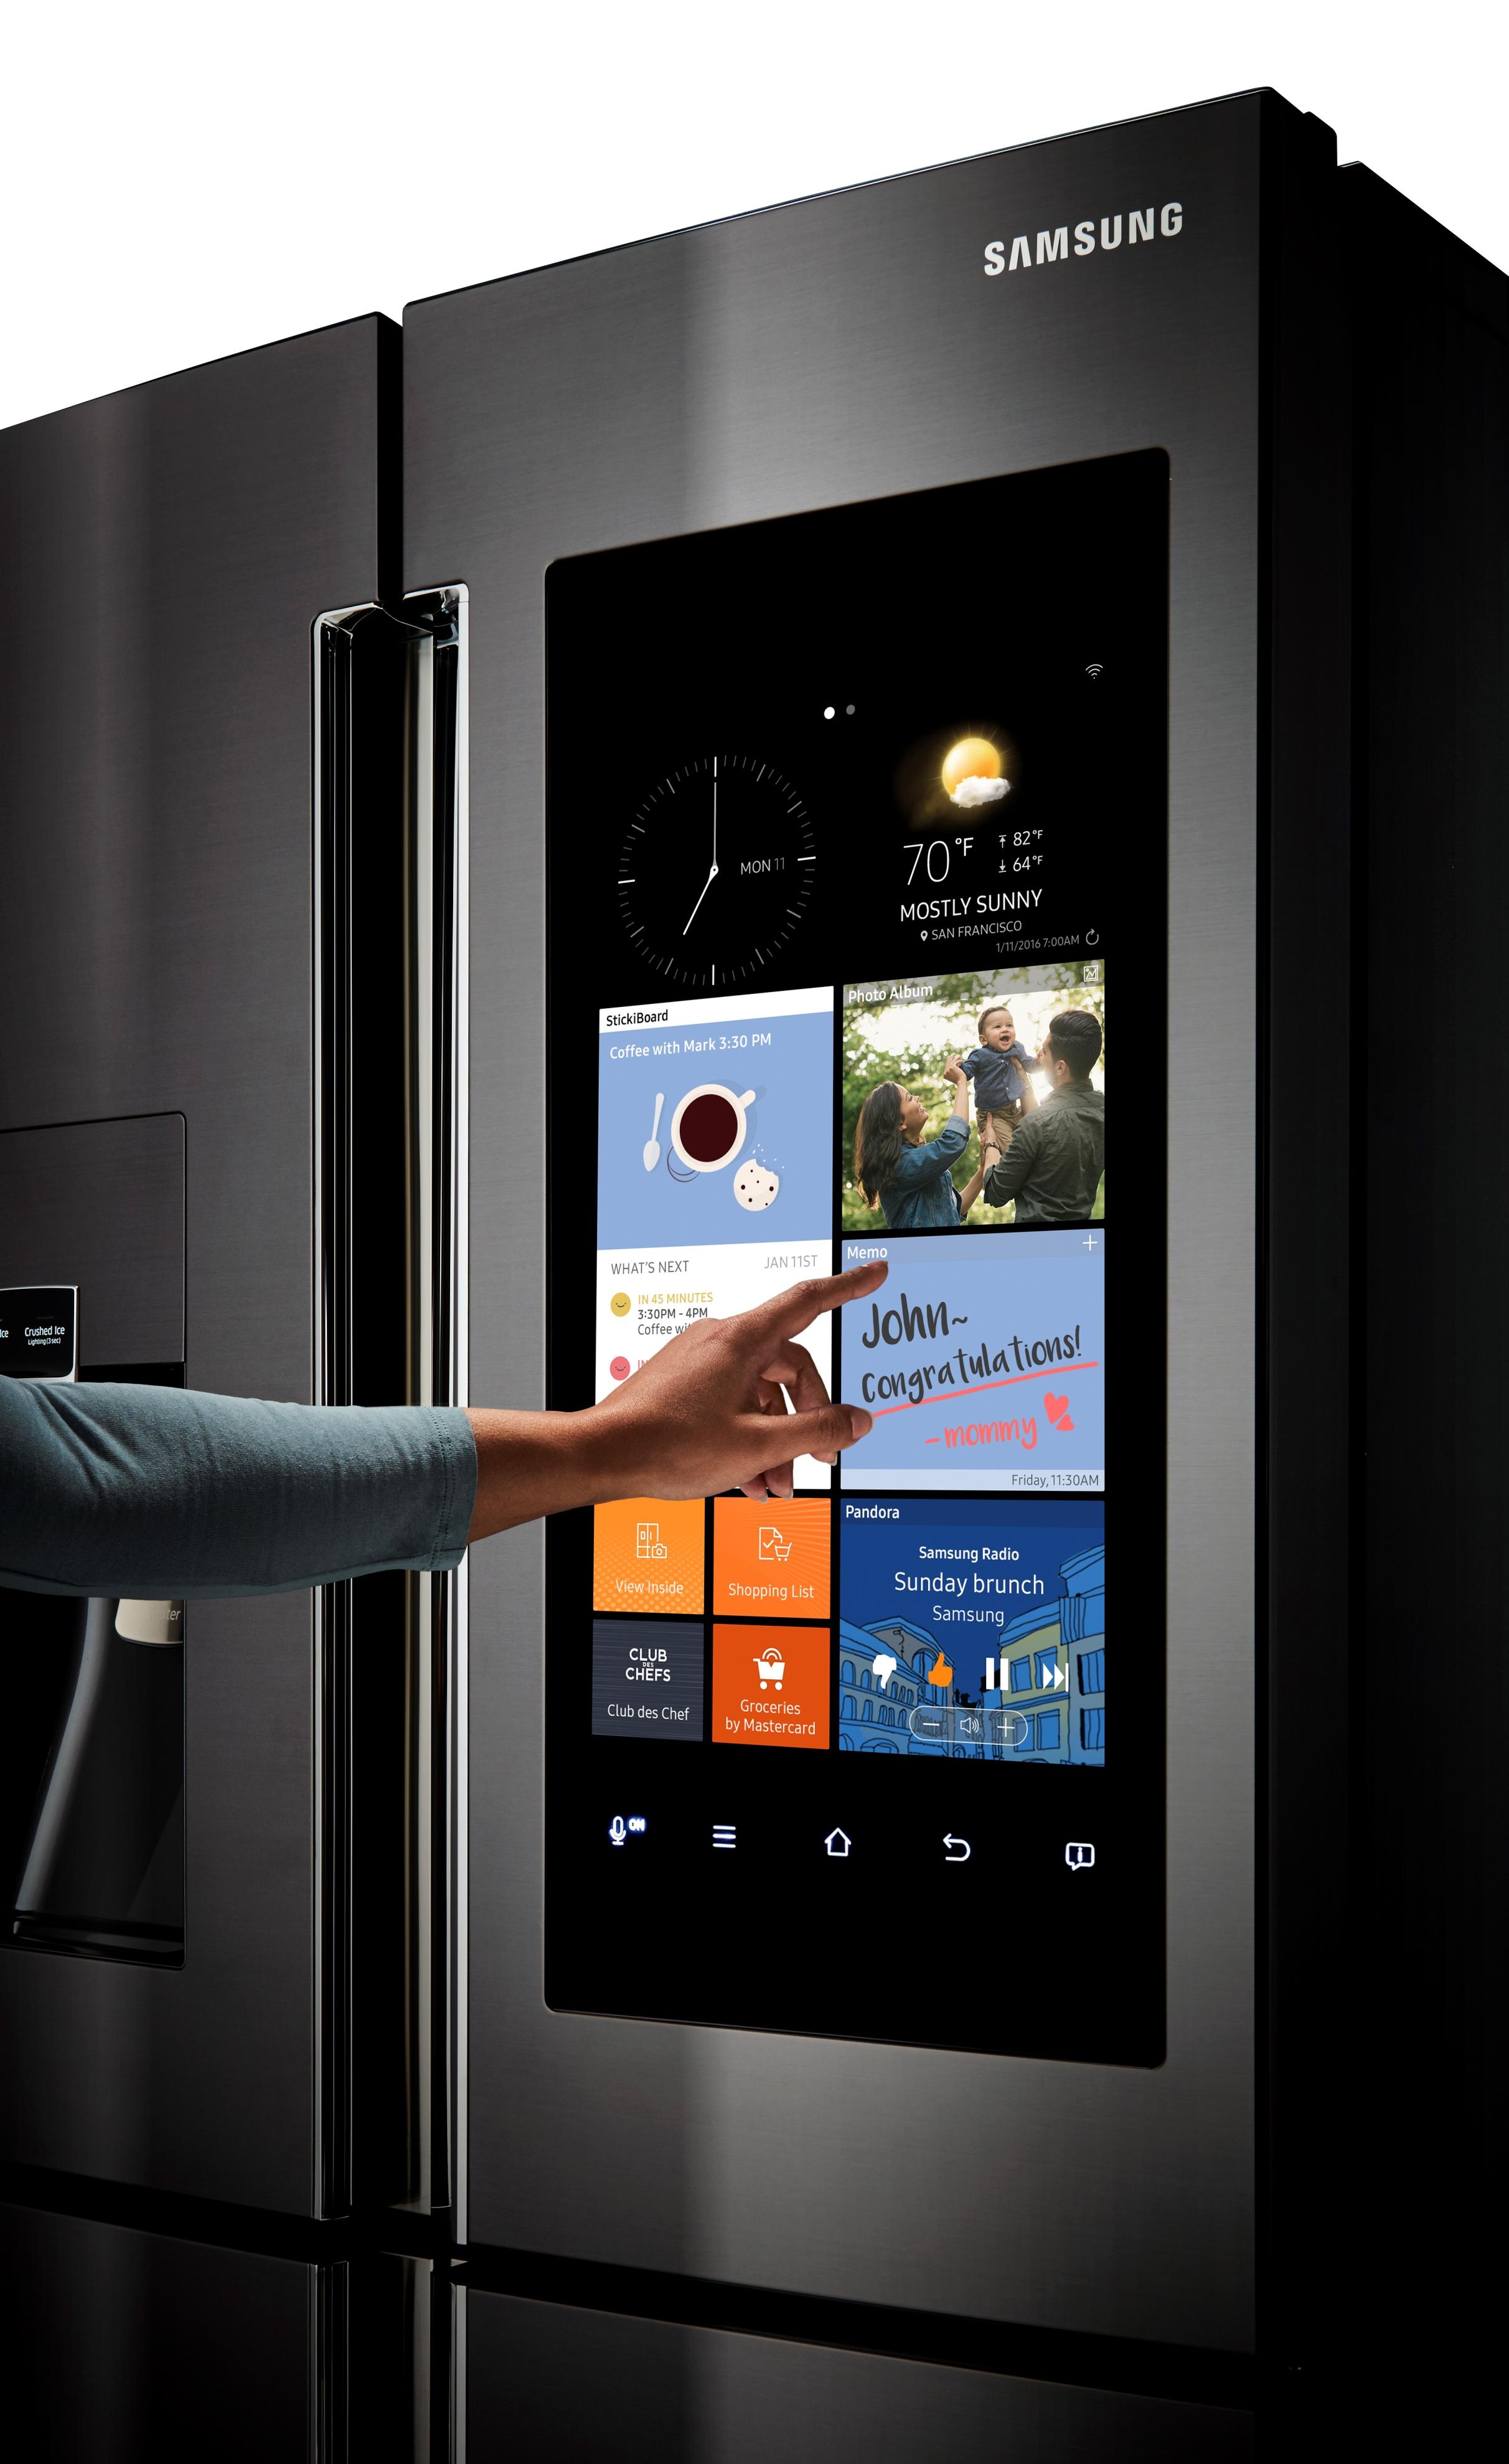 Samsung RF22K9581SG/AA 22 cu. ft. Capacity Counter Depth 4-Door Flex™ Refrigerator with Family Hub™ Black Stainless Steel